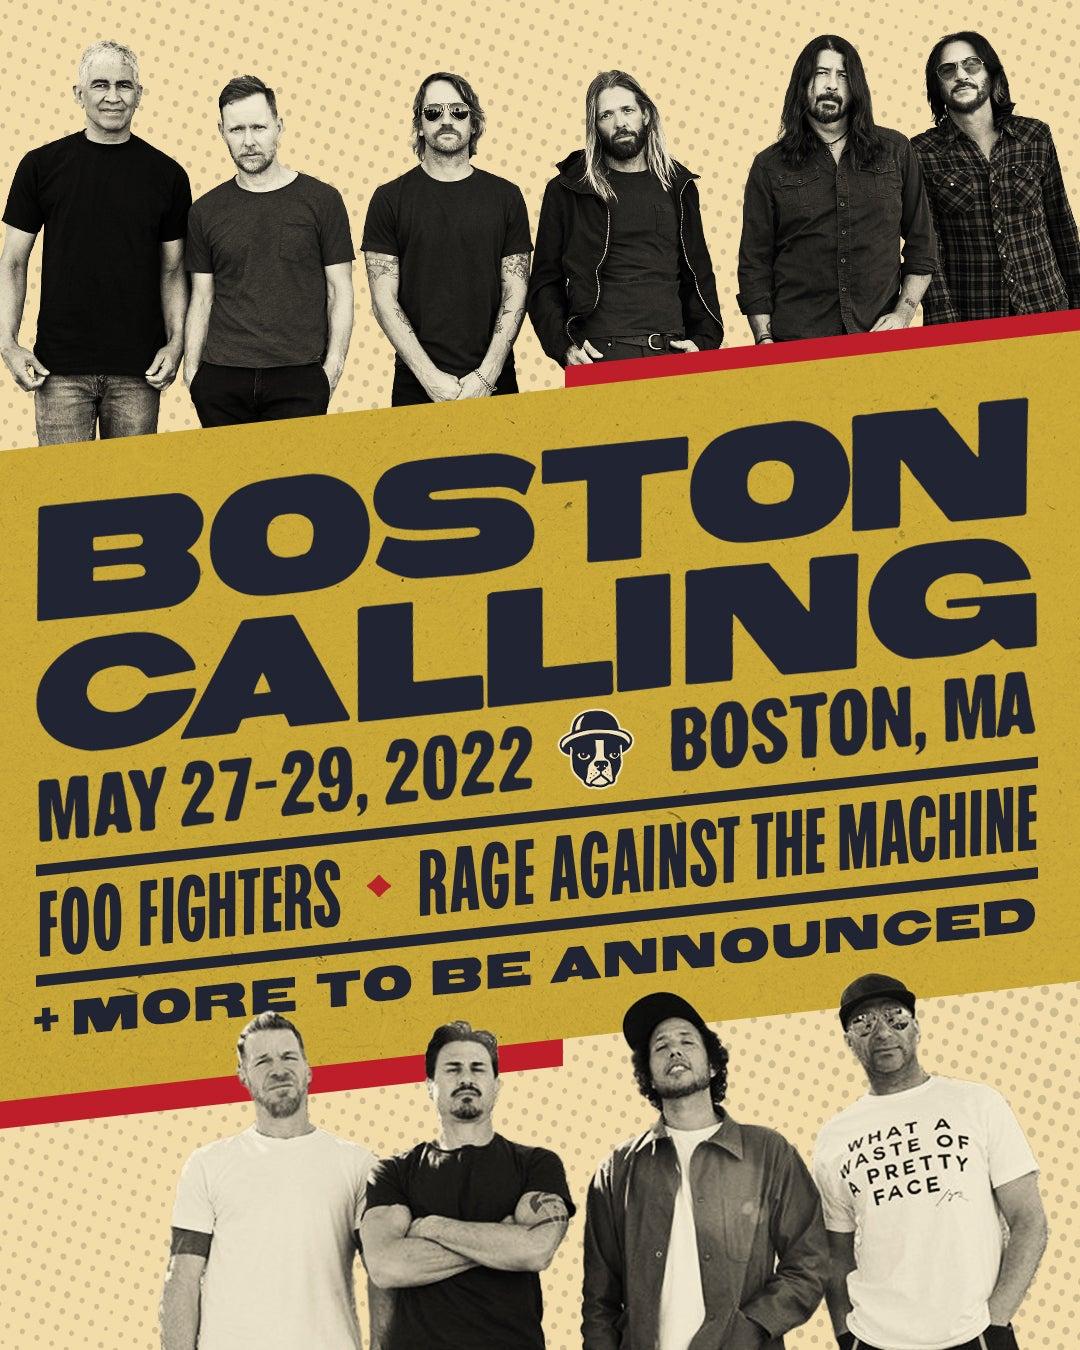 Boston Calling 2022 headliner announcement.